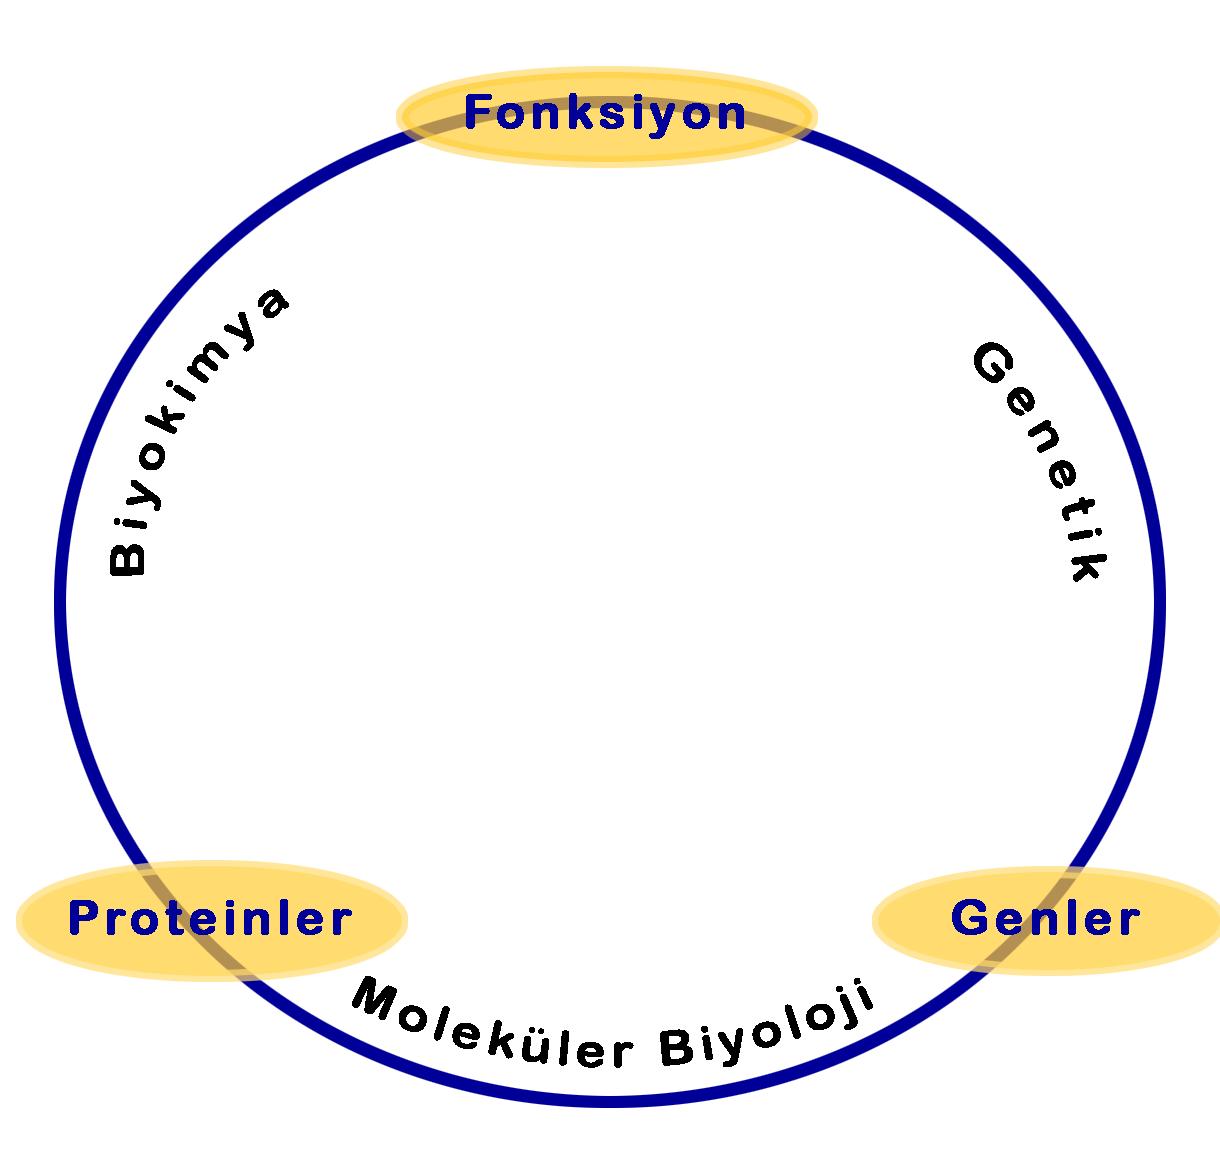 Dosya:molekuler biyoloji